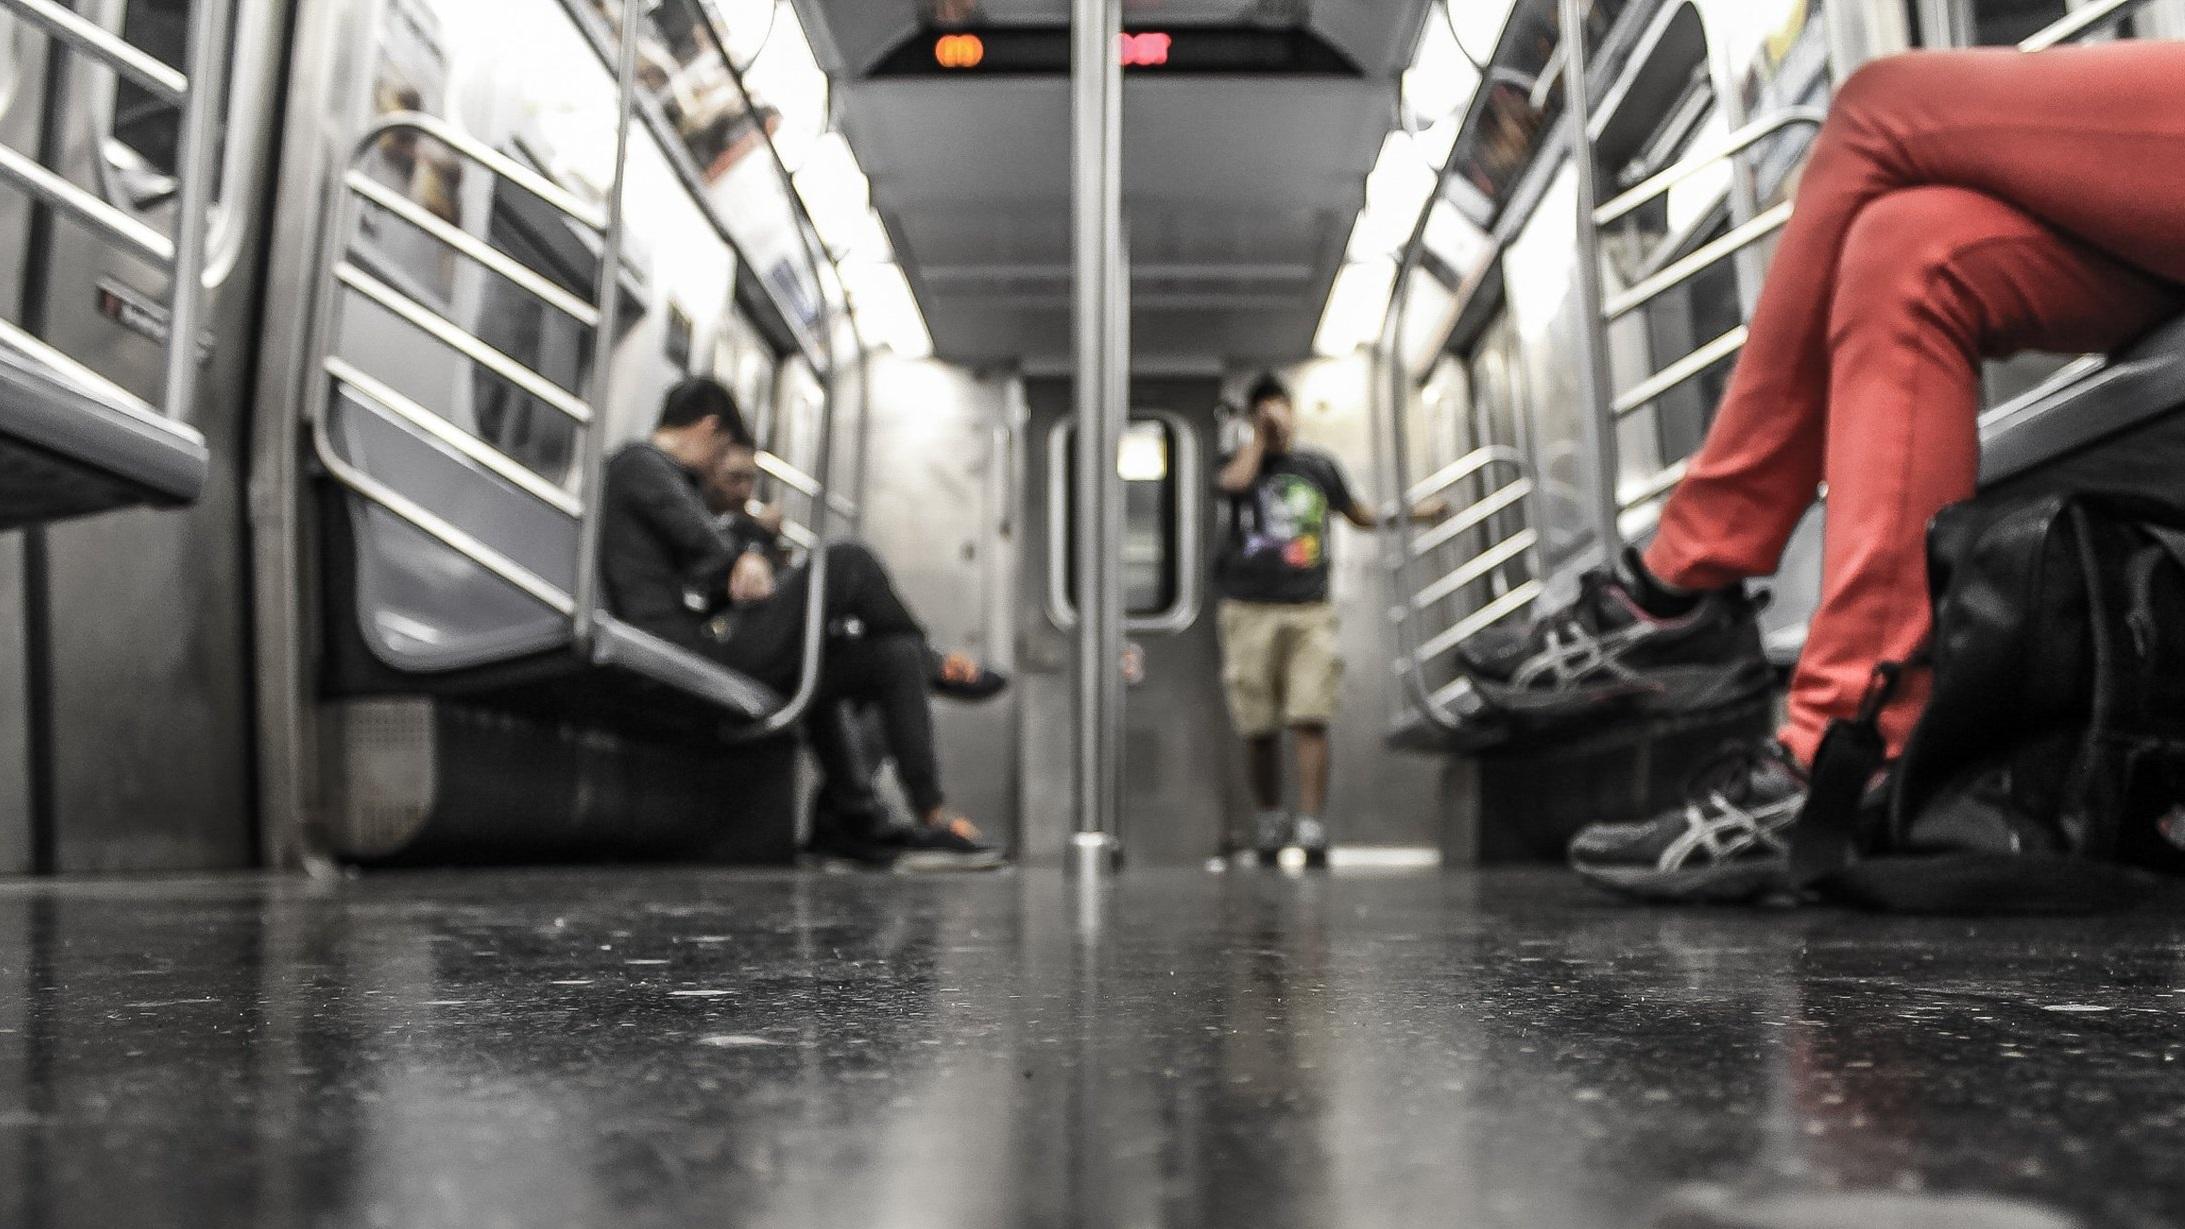 people-public-transportation-subway-11839.jpg